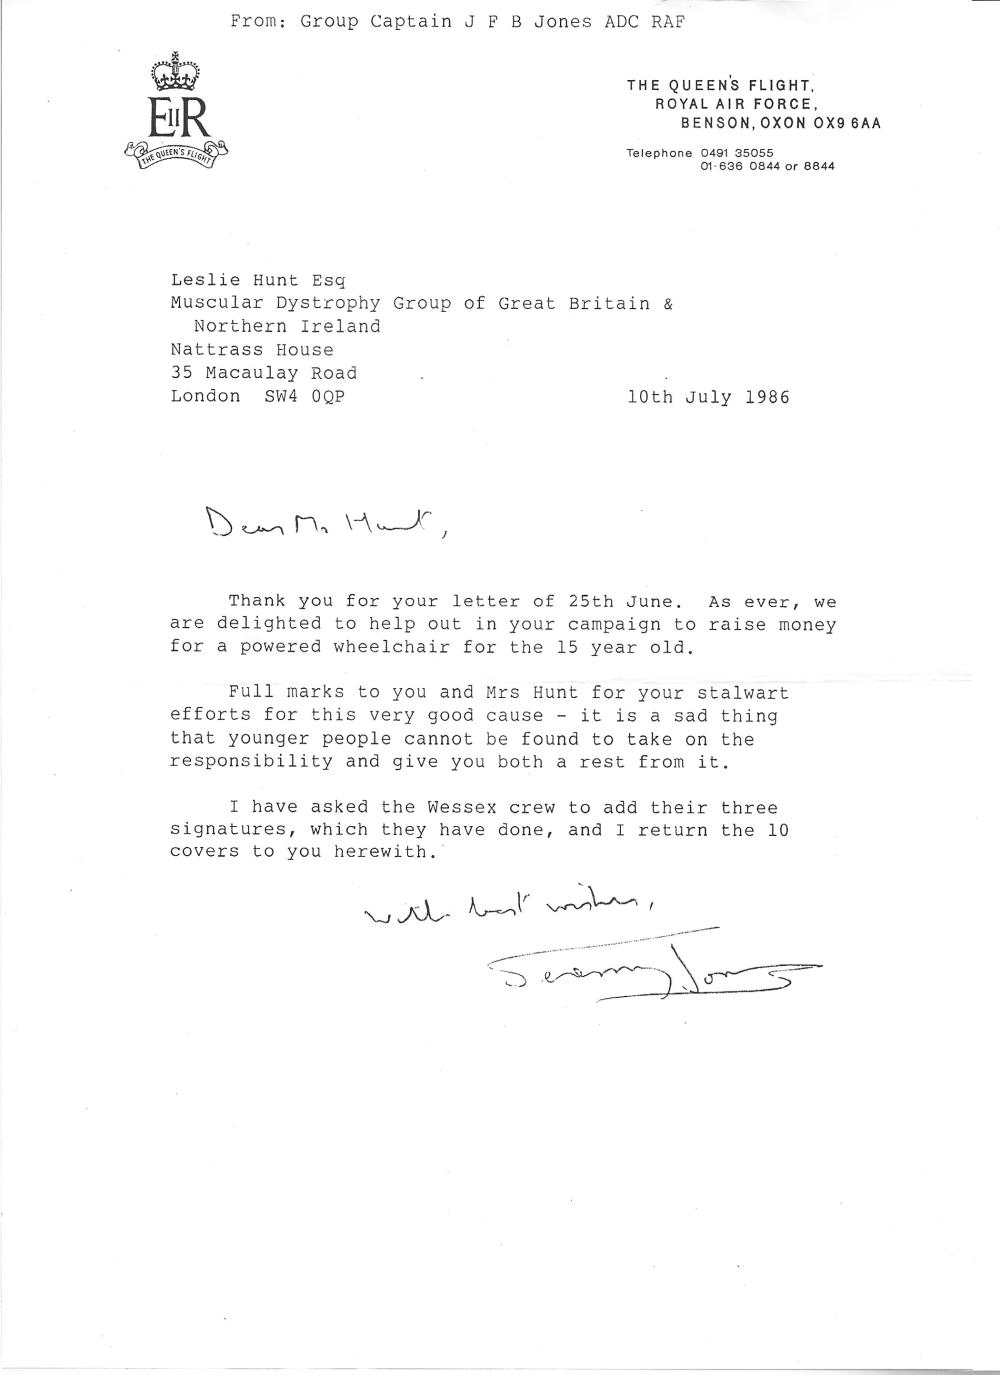 Grp Cptn Jeremy Jones TLS dated 10/7/1986. Good condition Est.